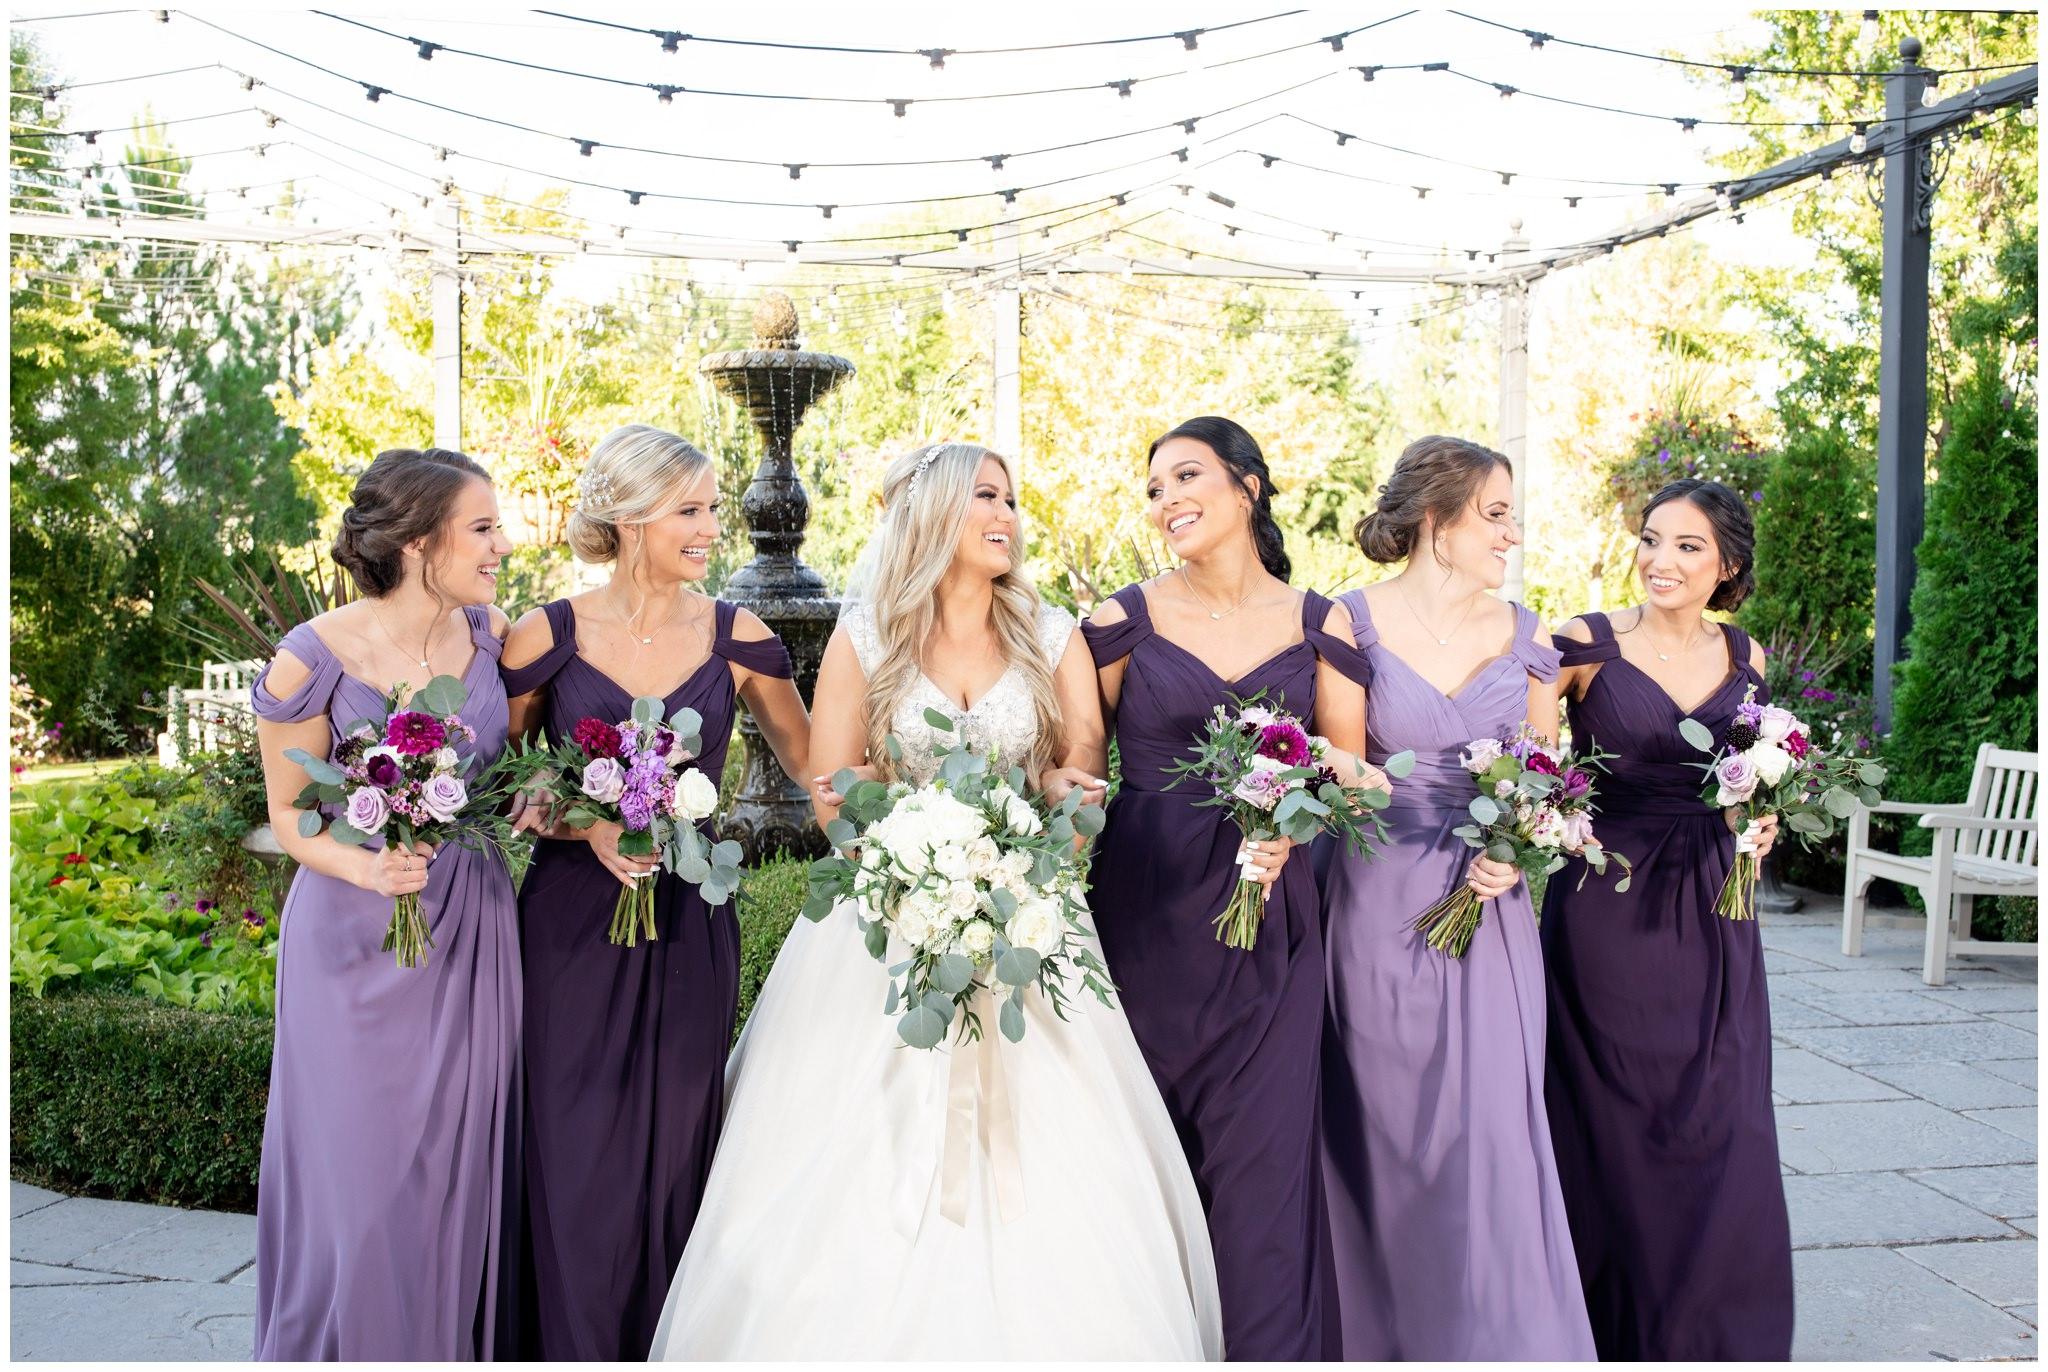 Bridesmaids pictures at Sleepy ridge